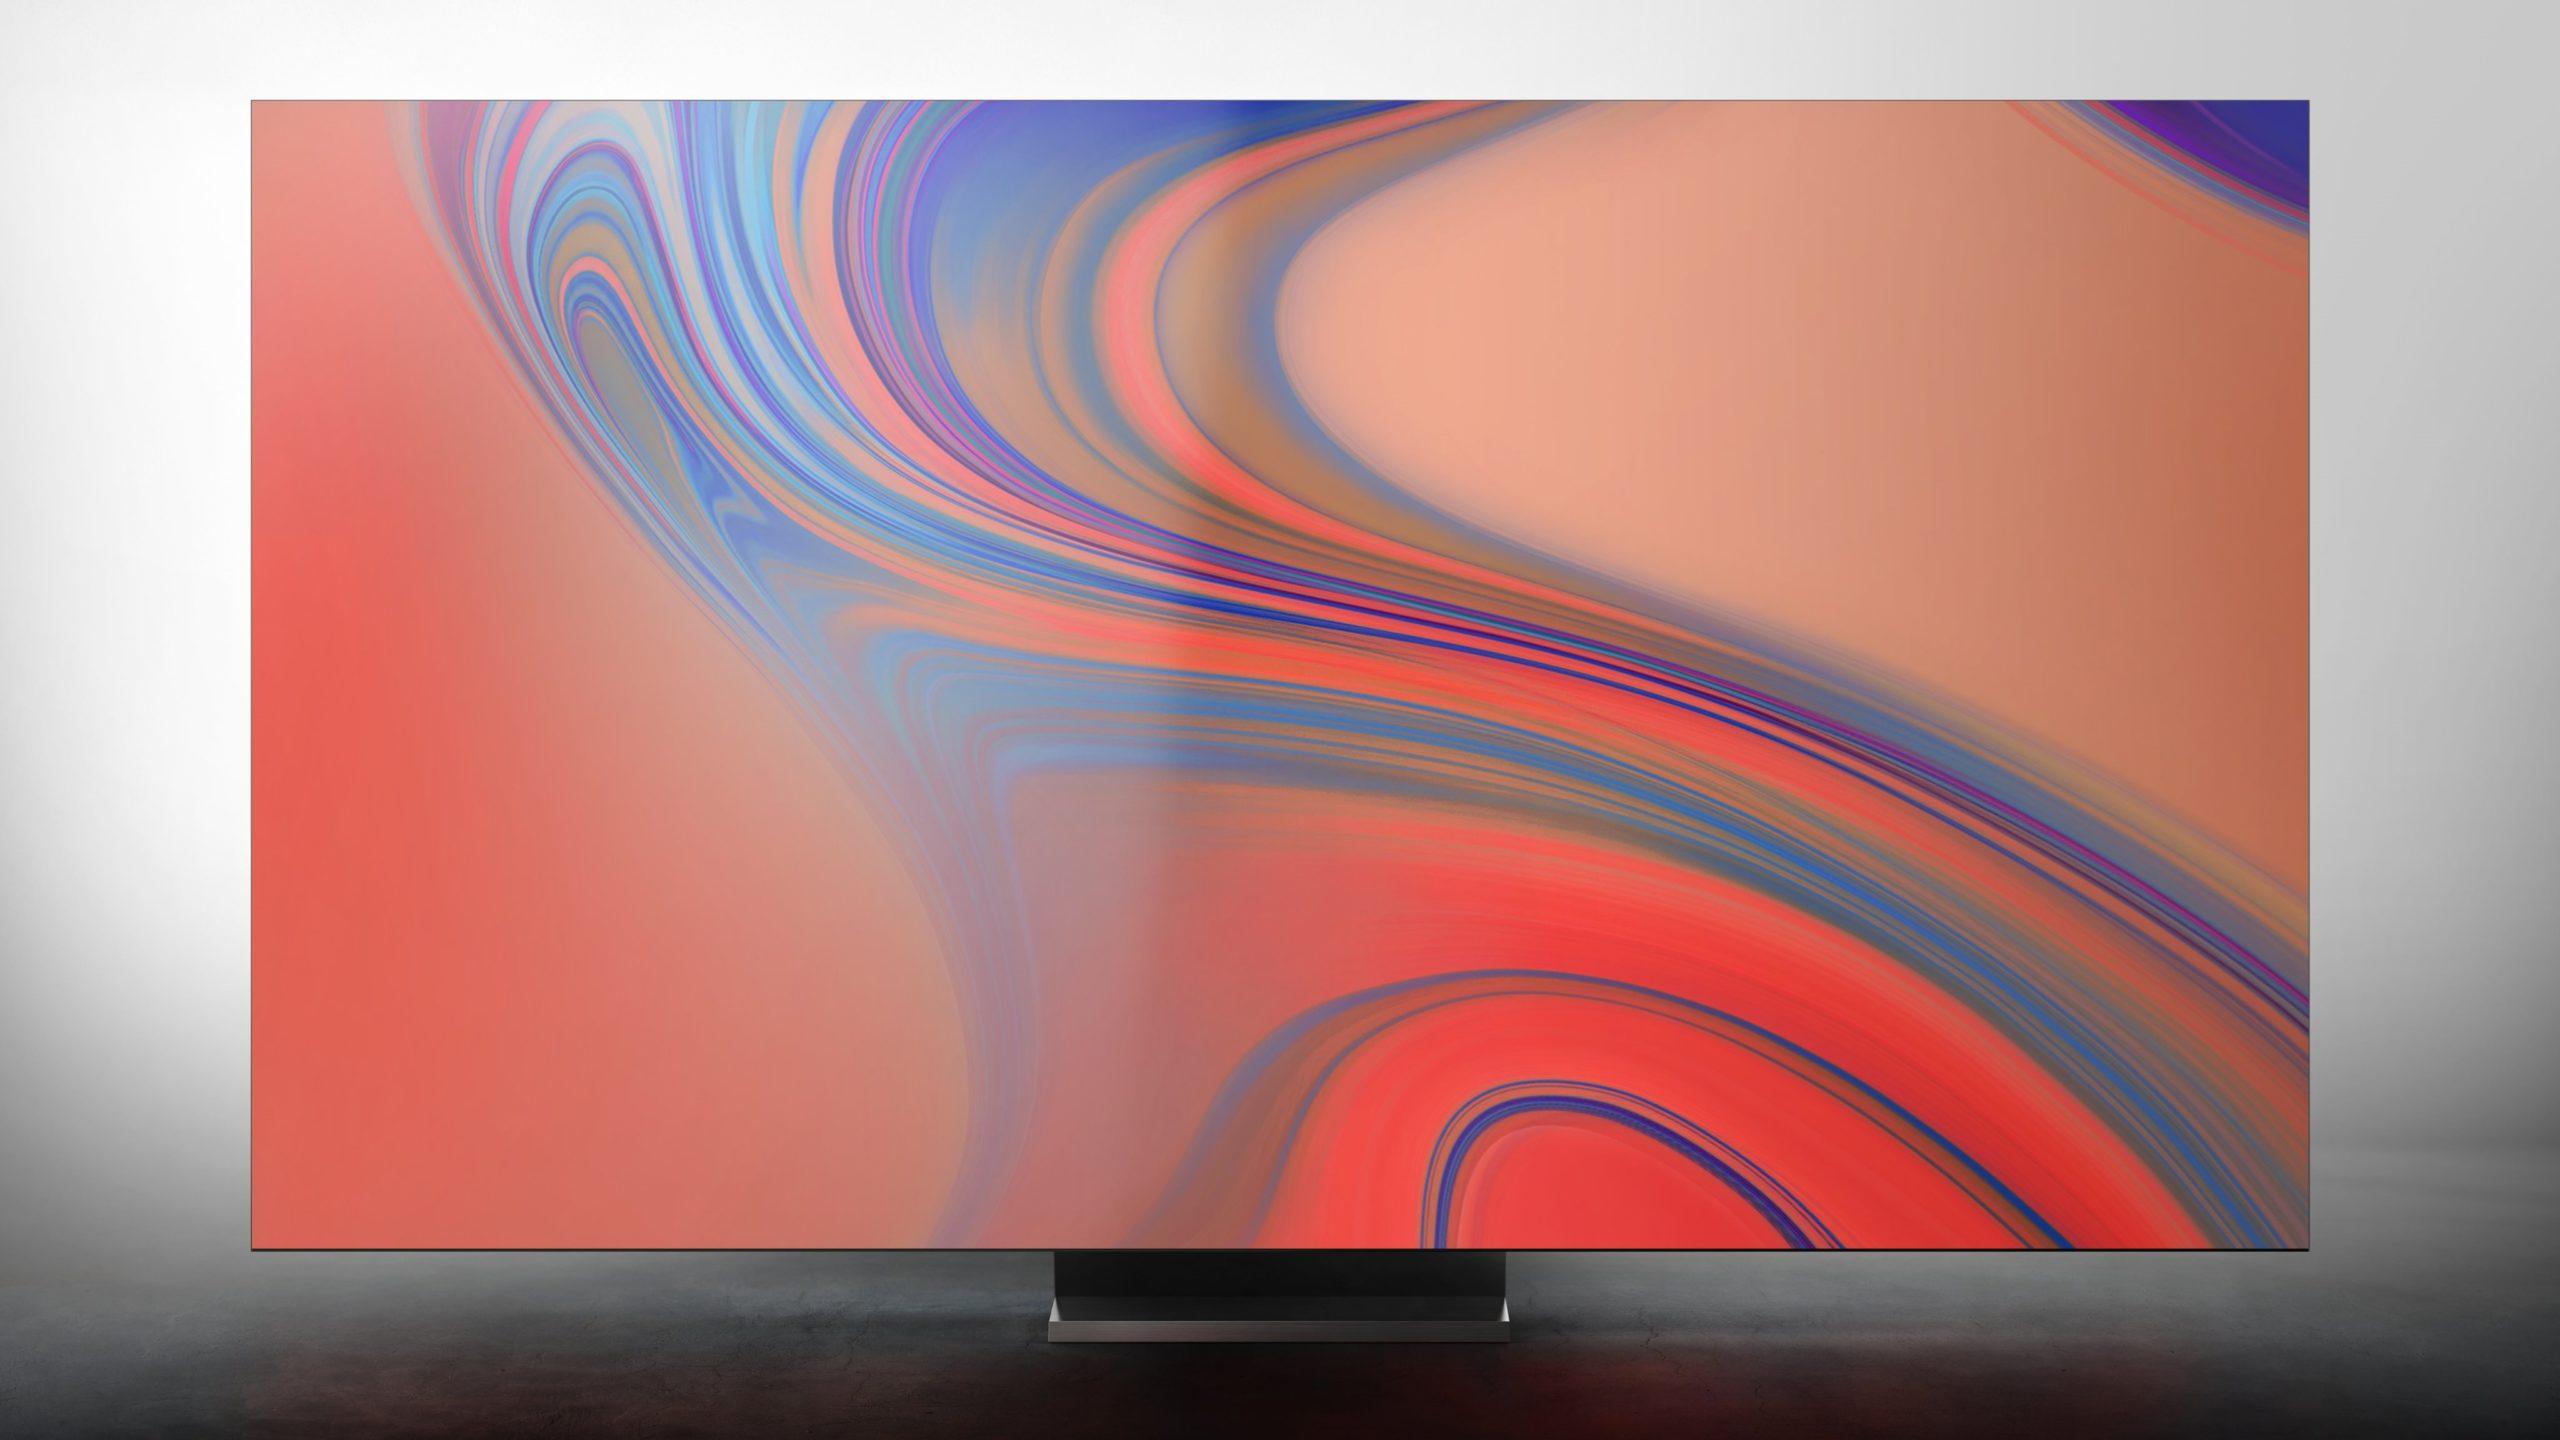 Samsung QLED 8K 65 inch Q950TS Smart TV (2020)